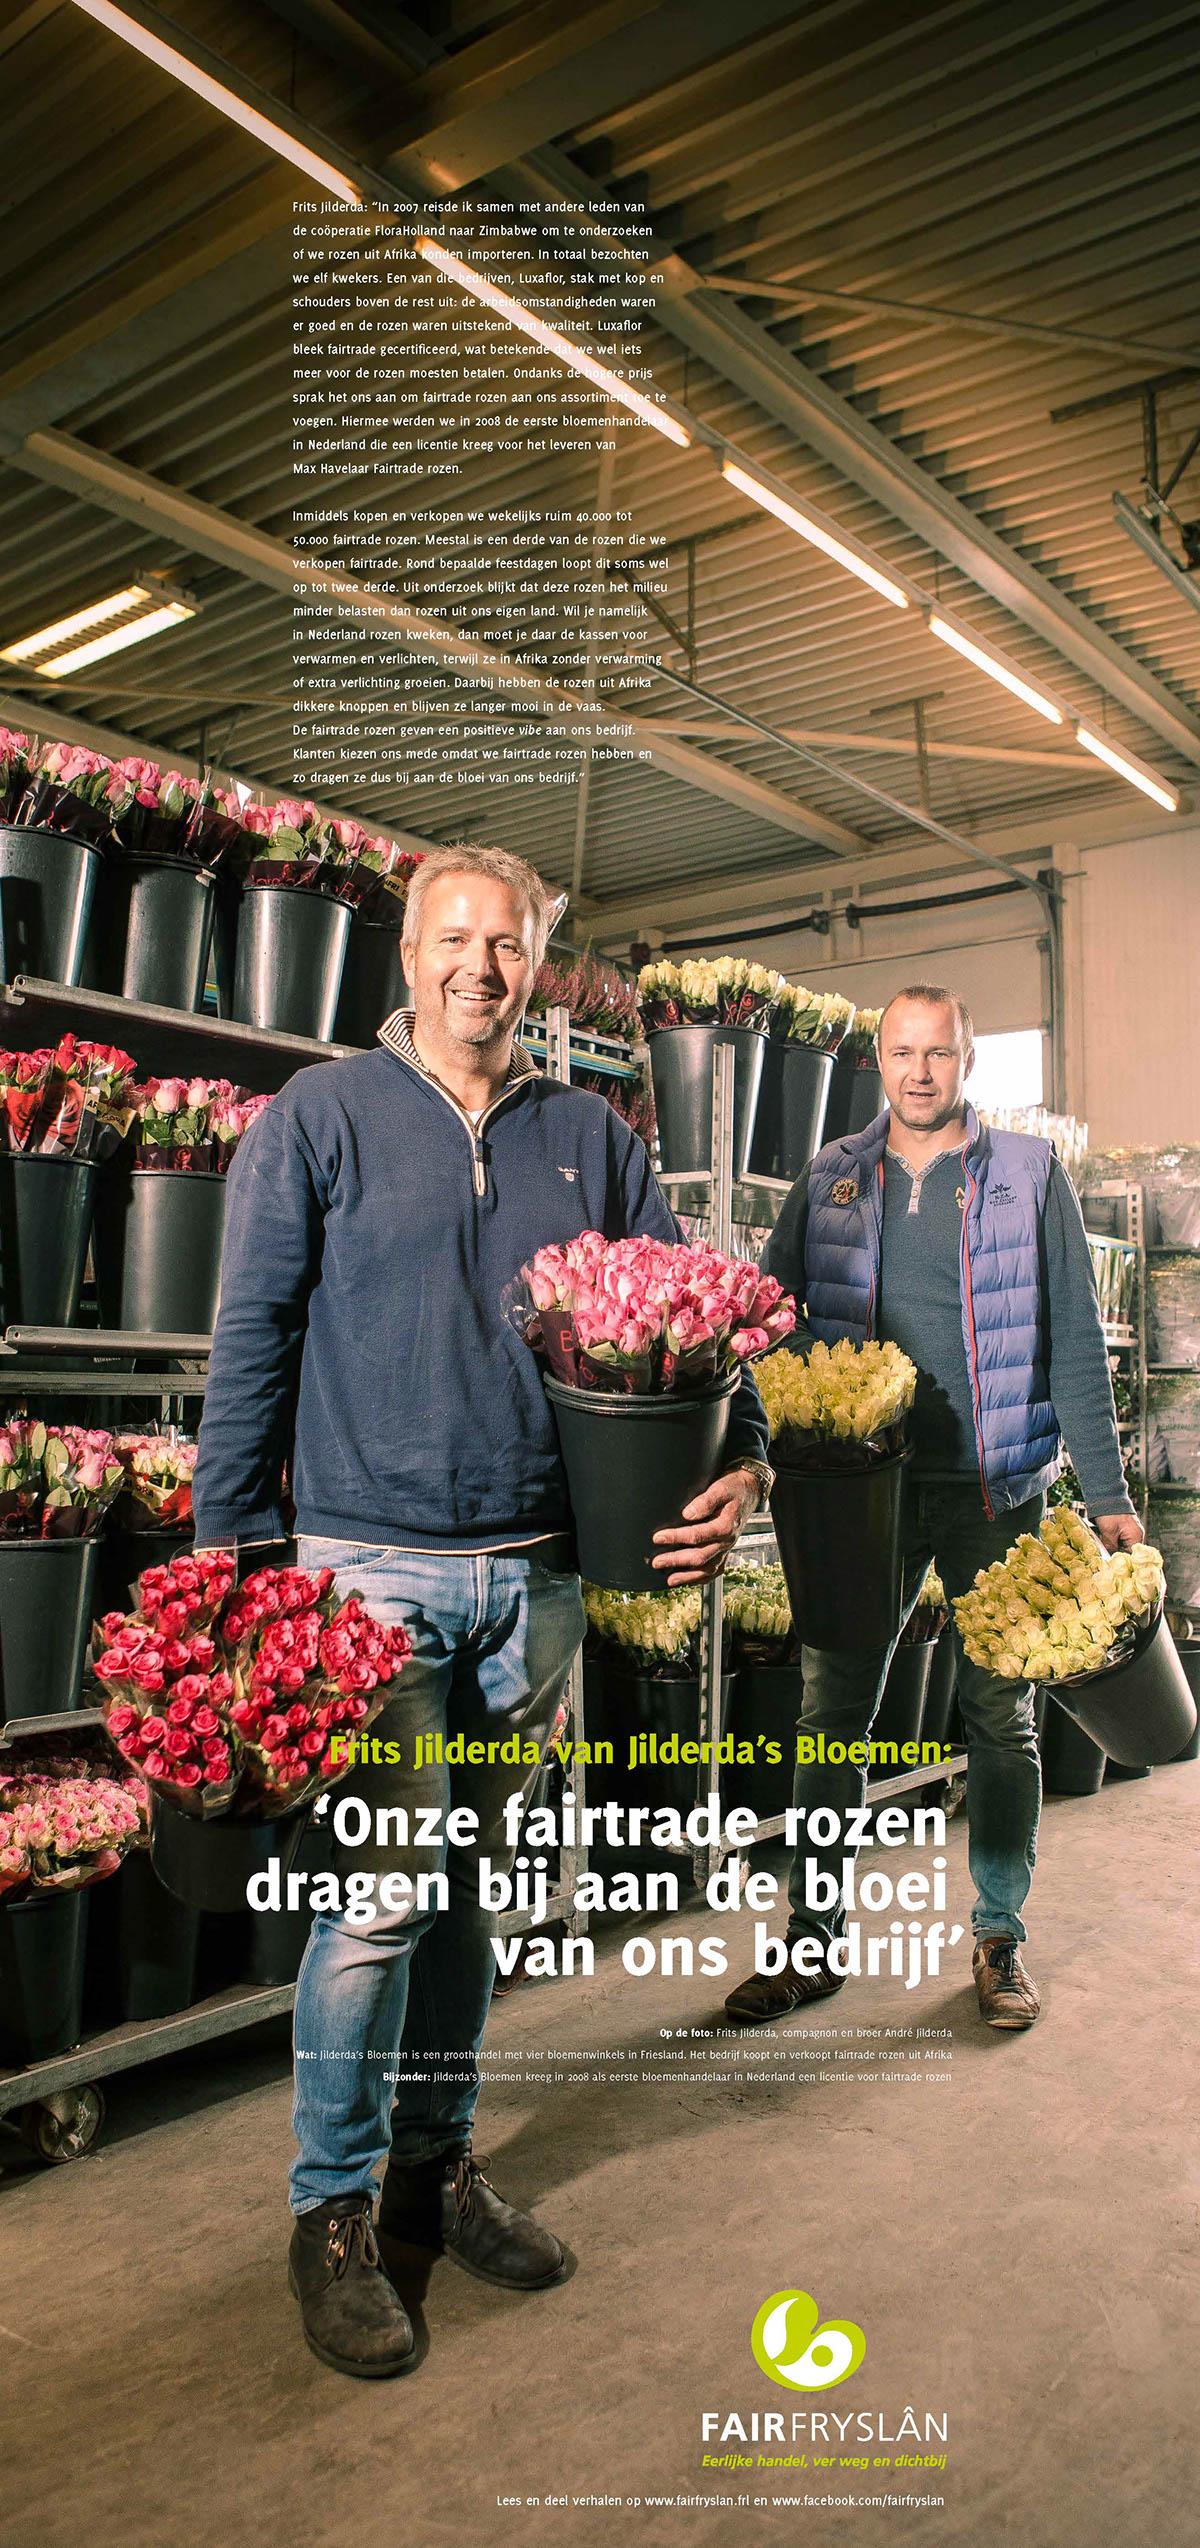 fair fryslan bioweb welcome to the village dutch beans royaal belegd